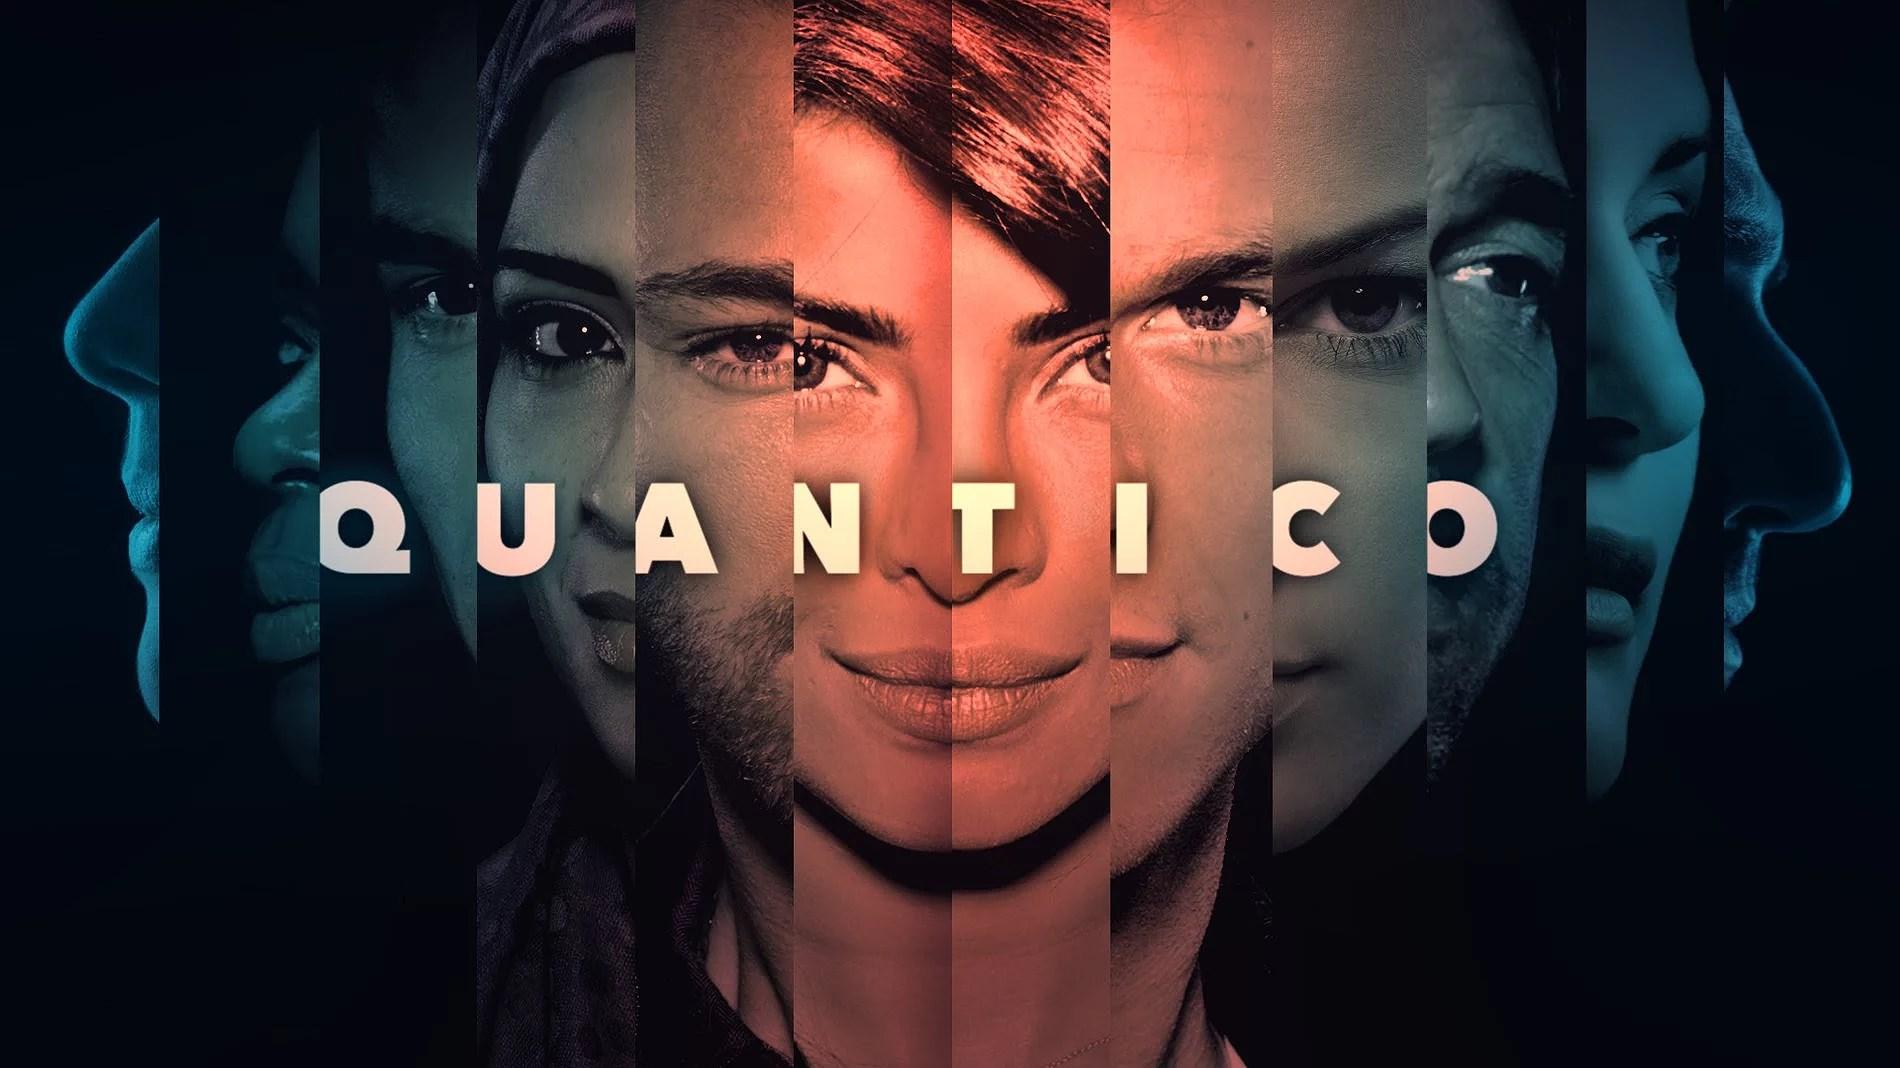 Quantico-2015-Tv-Series-Poster-Wallpaper